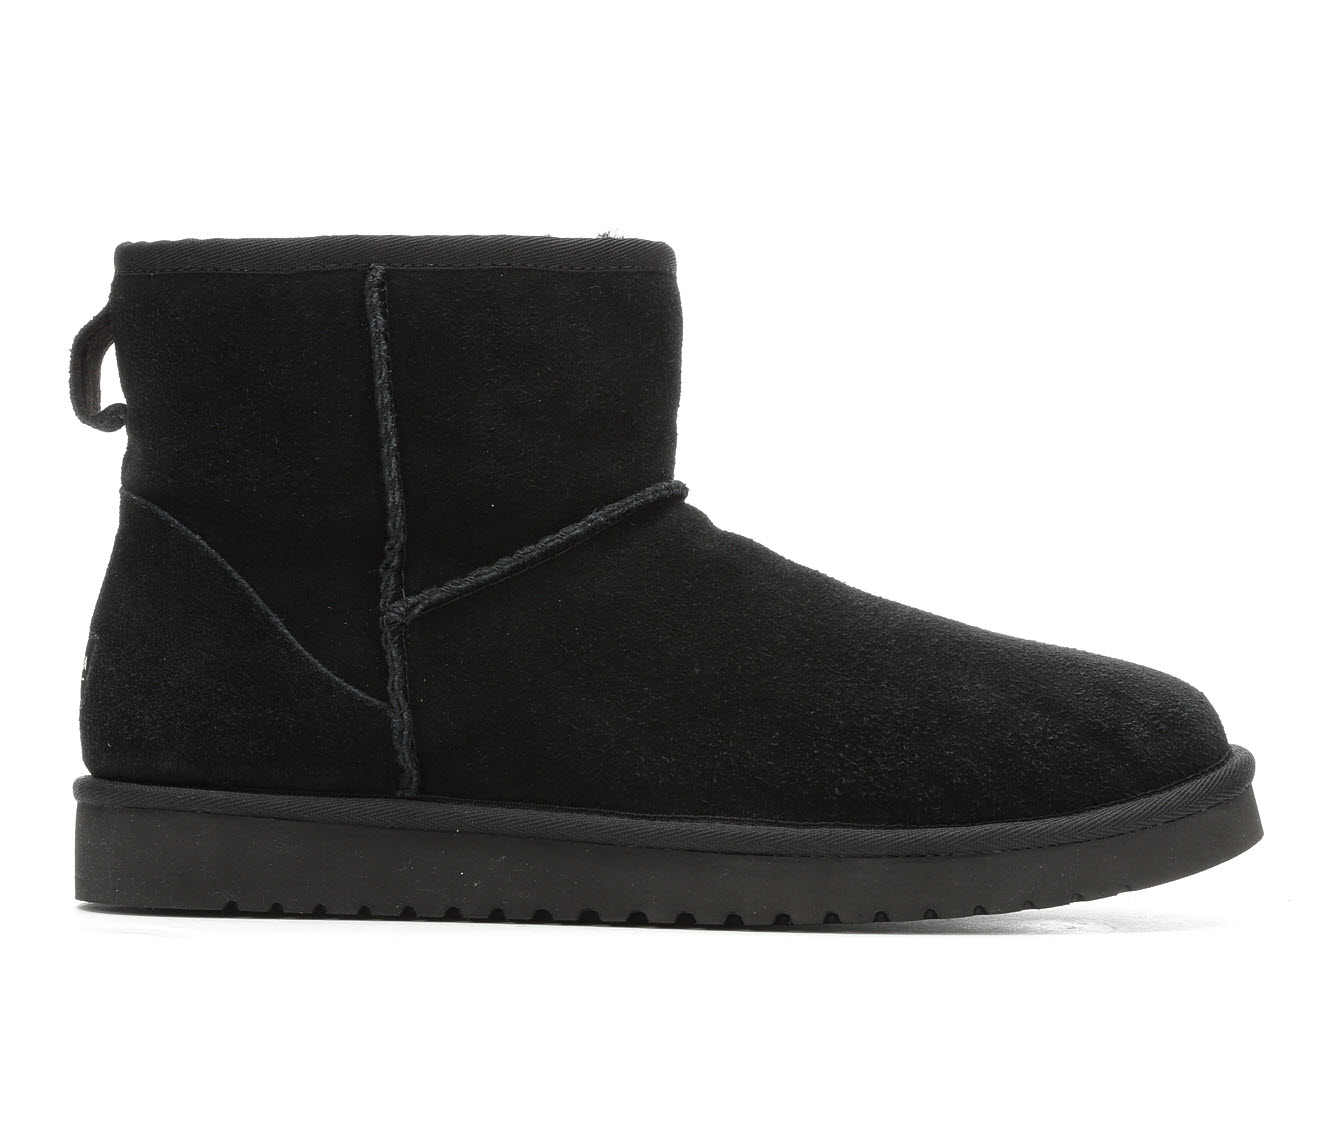 Koolaburra by UGG Burra Mini Men's Boots (Black Suede)